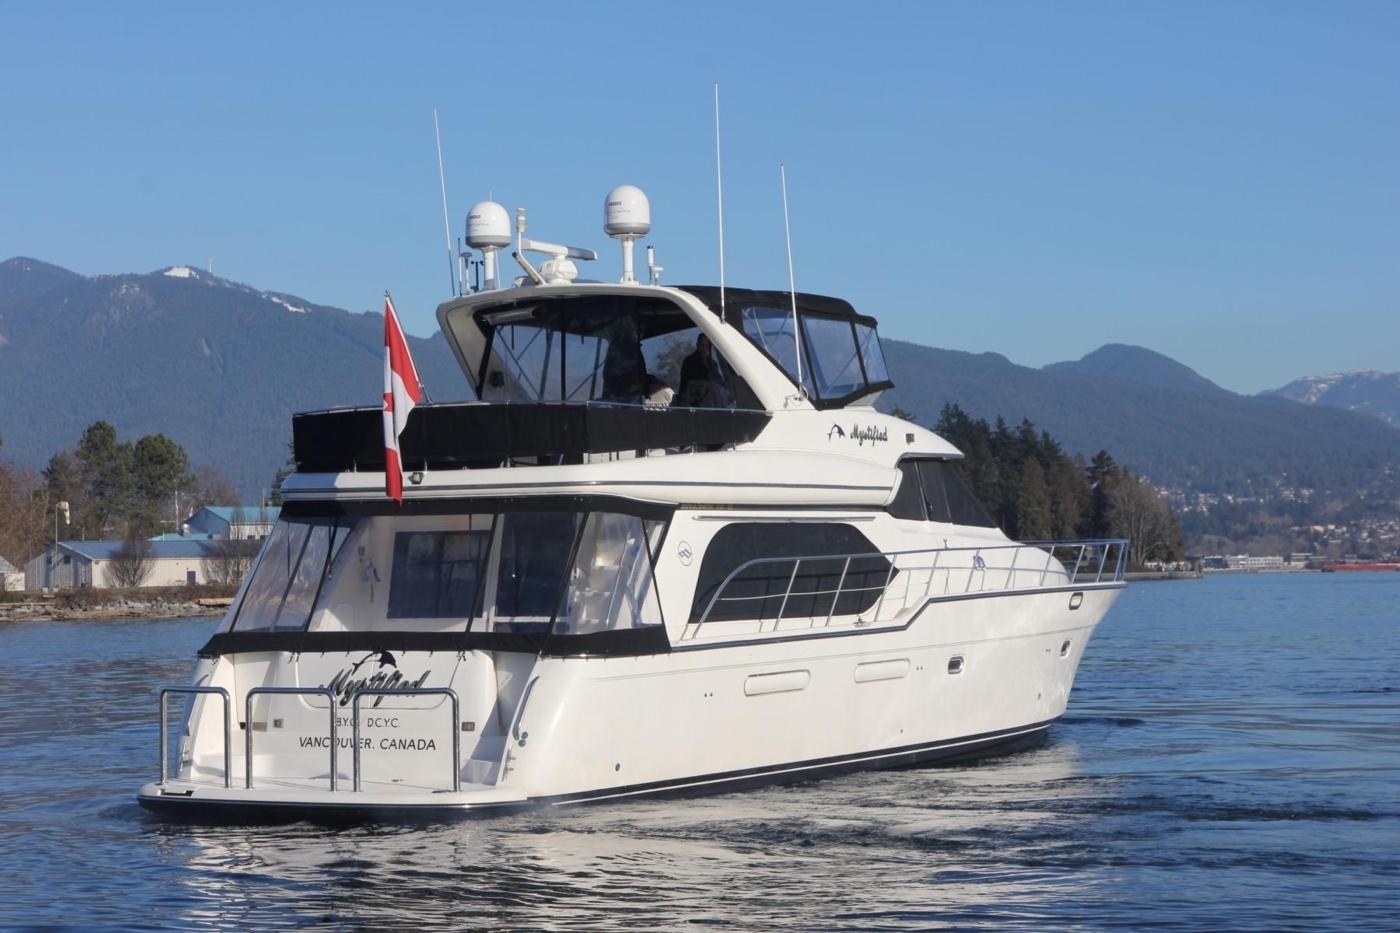 1999 Bayliner 5788 Pilot House Motoryacht, Vessel Profile Aft